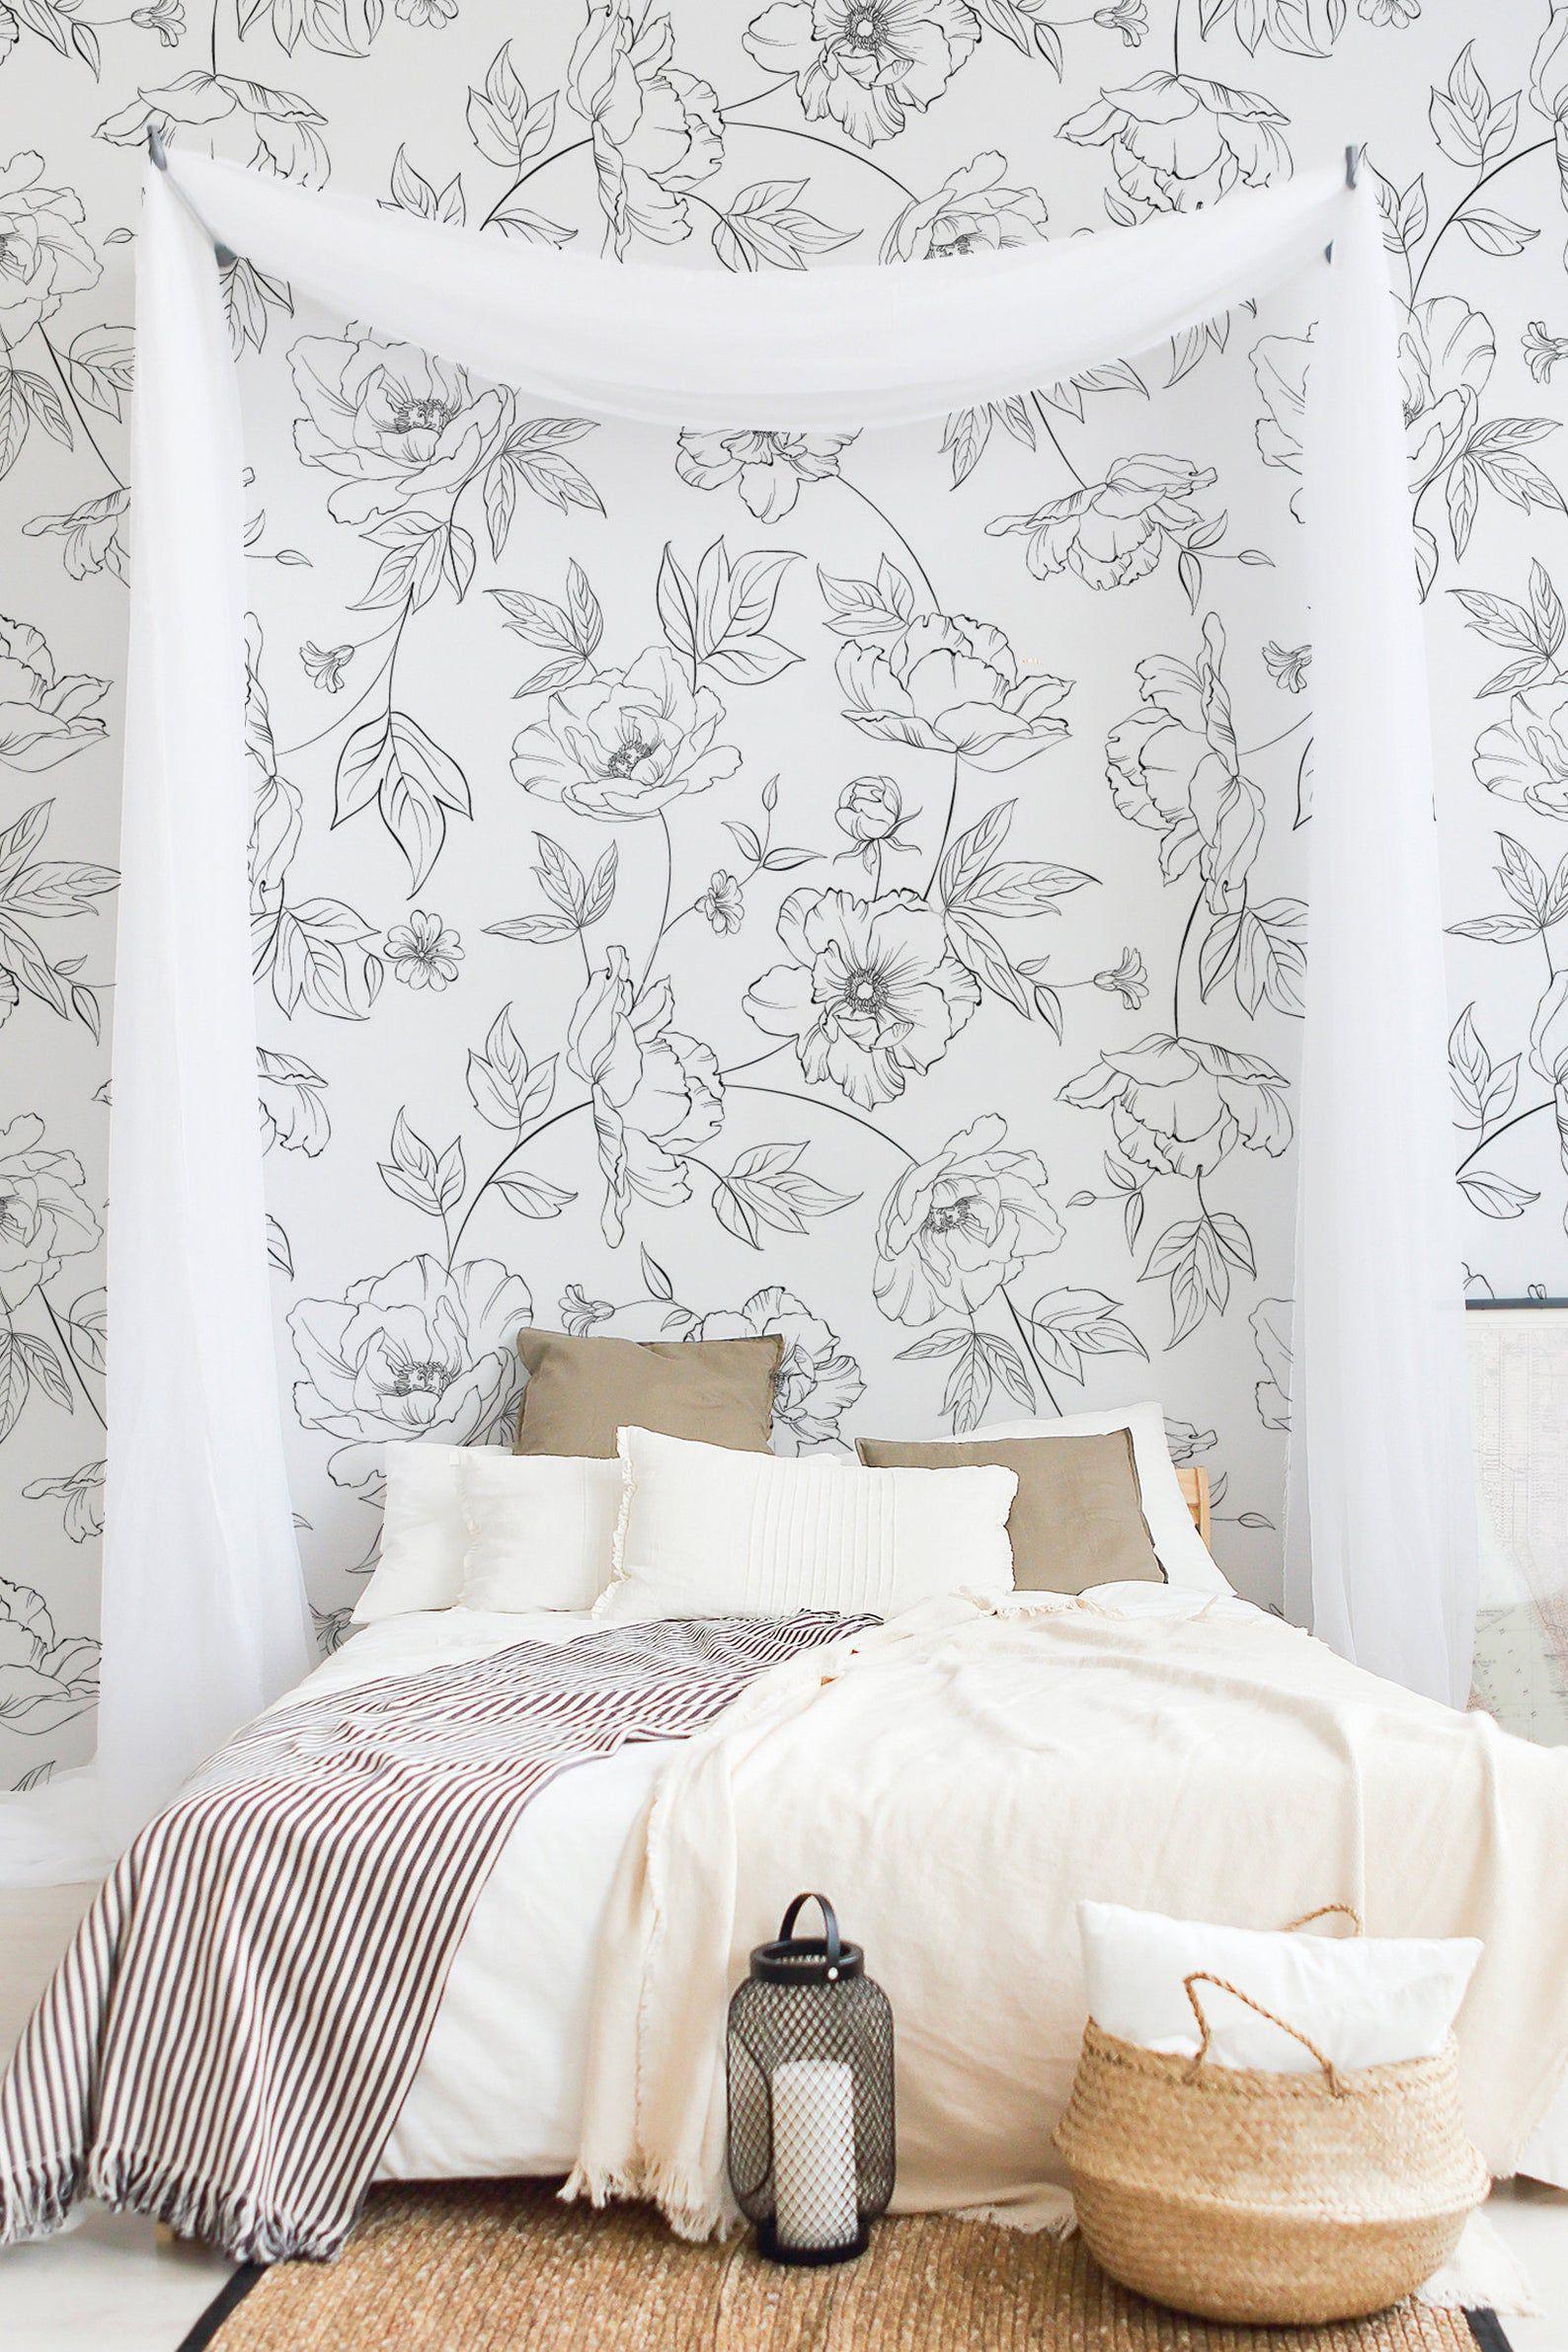 Grey Floral Wallpaper Floral Nursery Wallpaper Floral Removable Wallpaper Peel And Stick Wallpaper With Floral Print For Nursery Wfl093 Grey Floral Wallpaper Floral Wallpaper Nursery Floral Wall